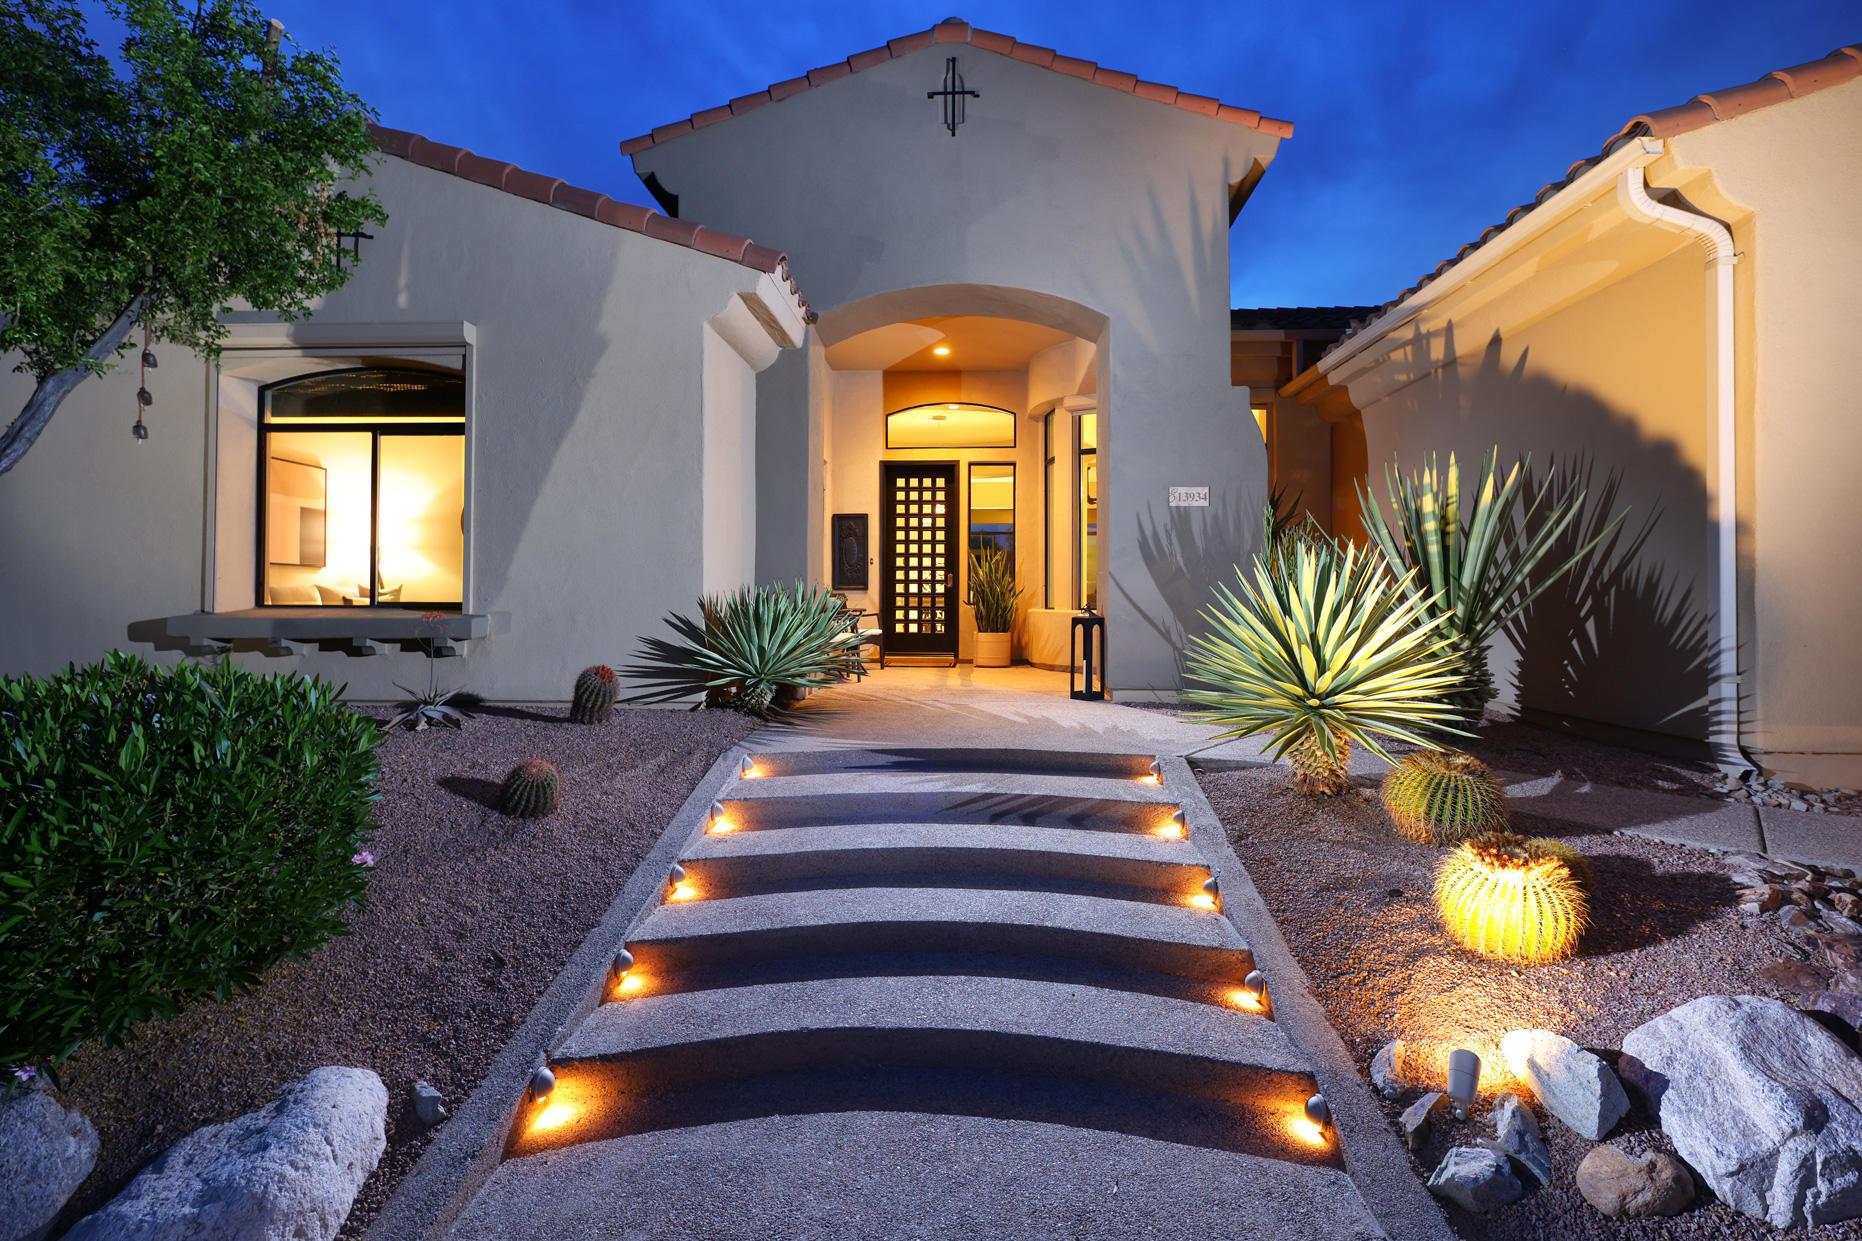 Photo of 13934 N Steprock Canyon Place, Oro Valley, AZ 85755